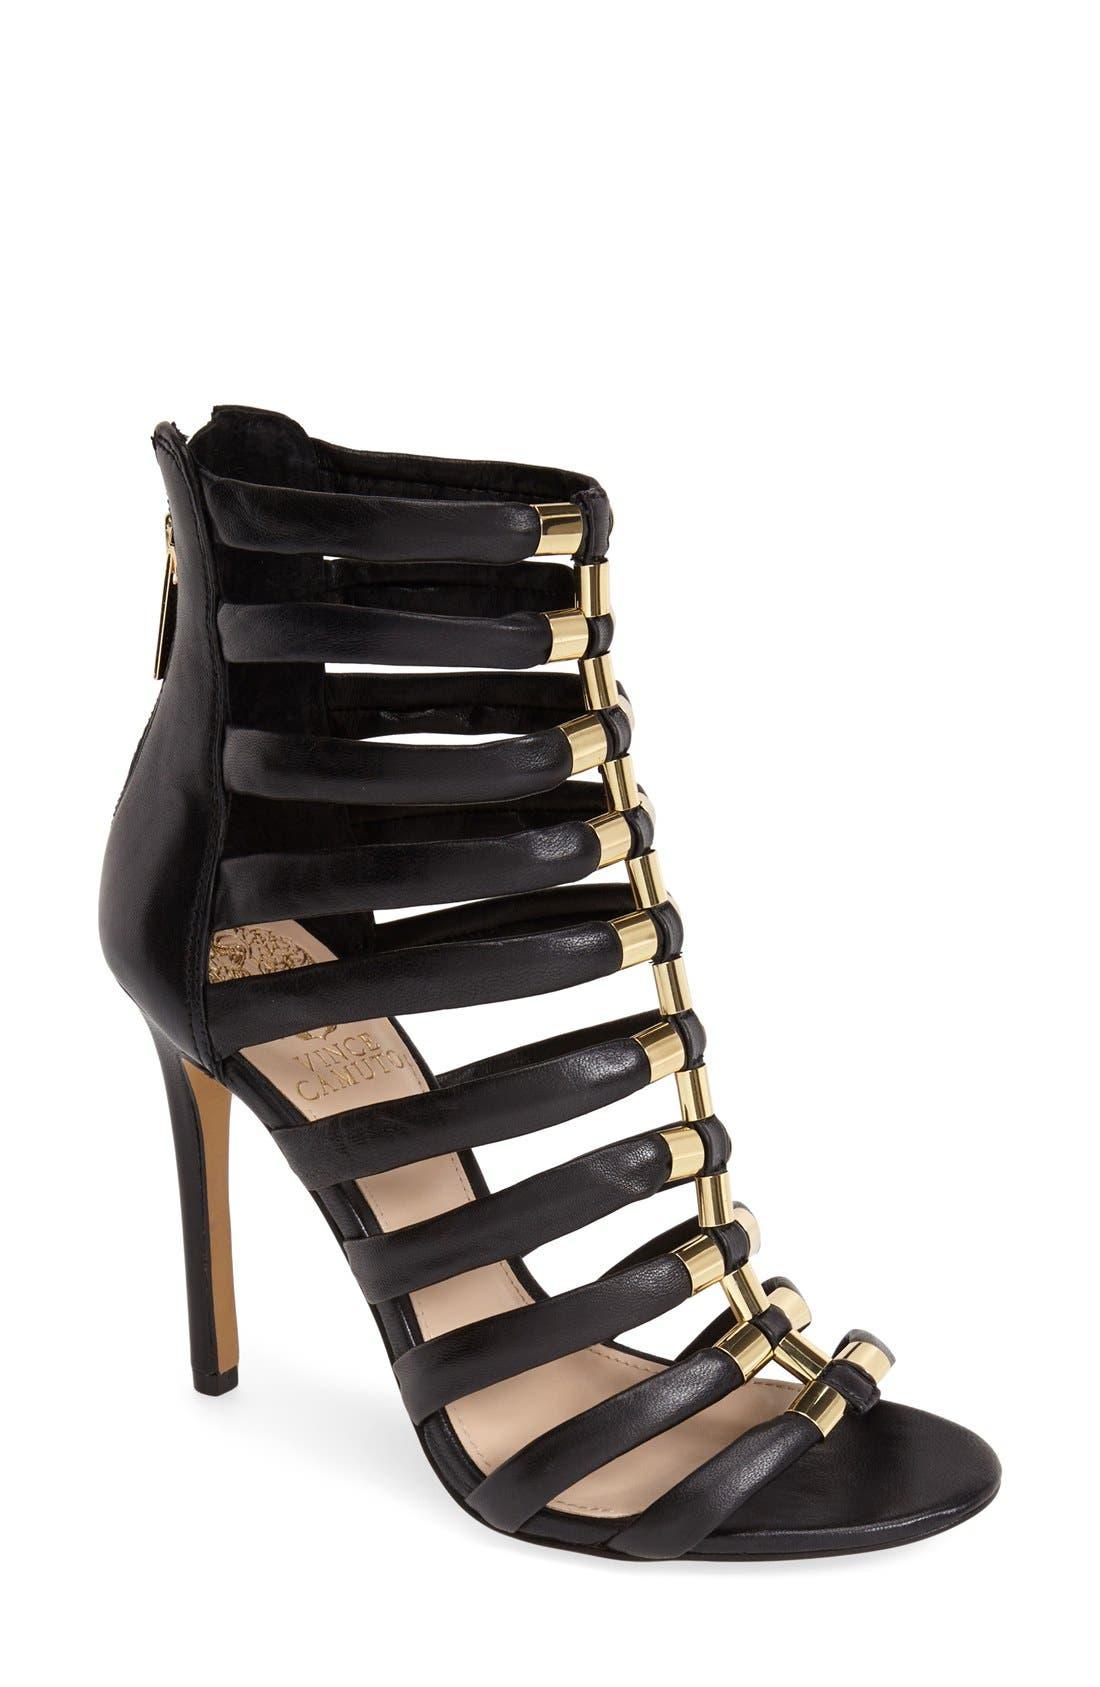 Main Image - Vince Camuto 'Troy' Gladiator Sandal (Women)